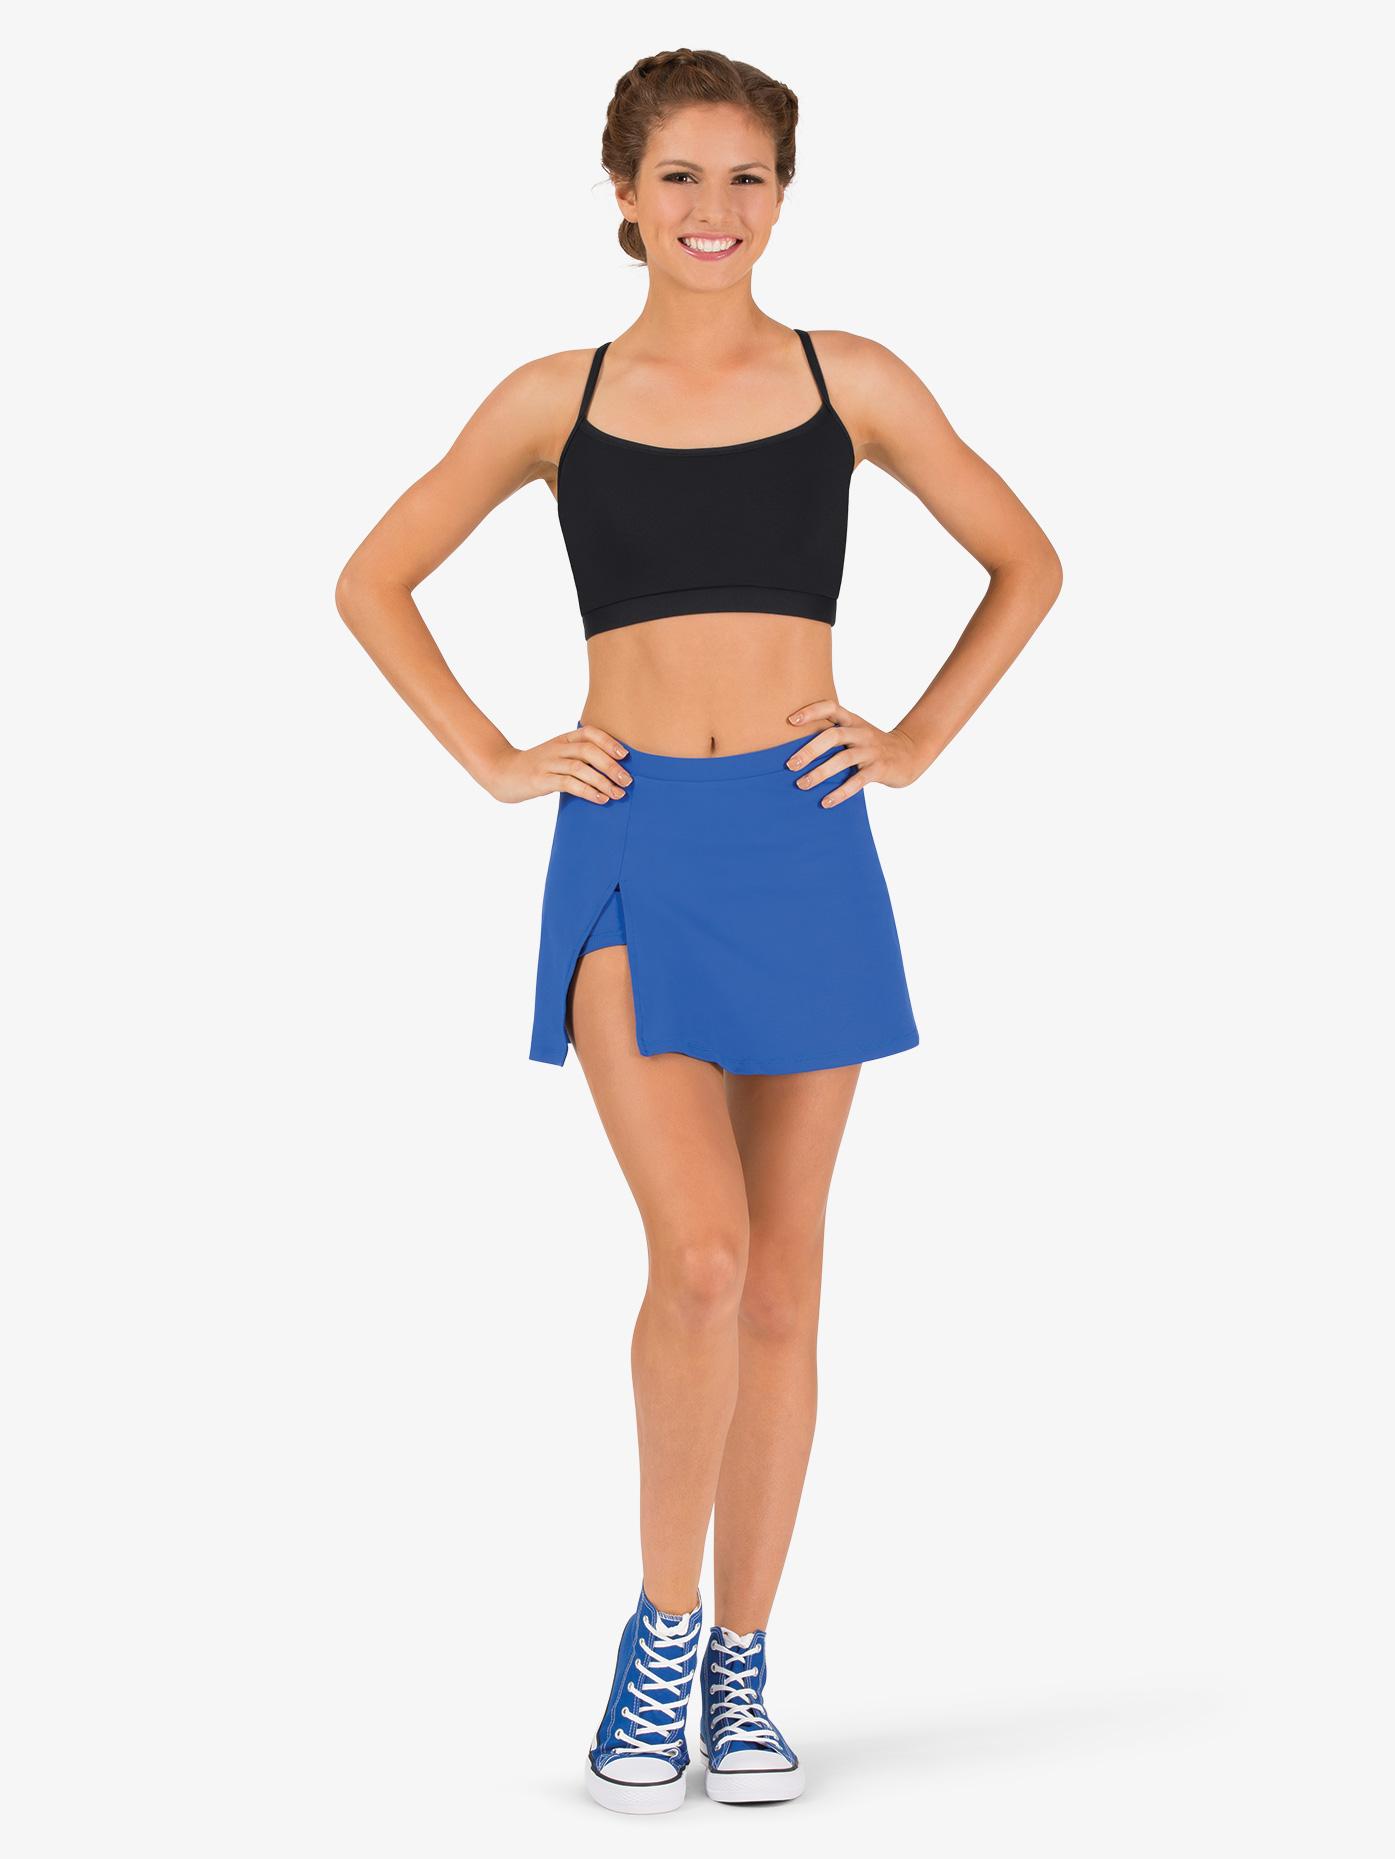 963b0f1ba9aa6 Womens Team Basic Compression Dance Skort - Style No BT5206. Loading zoom